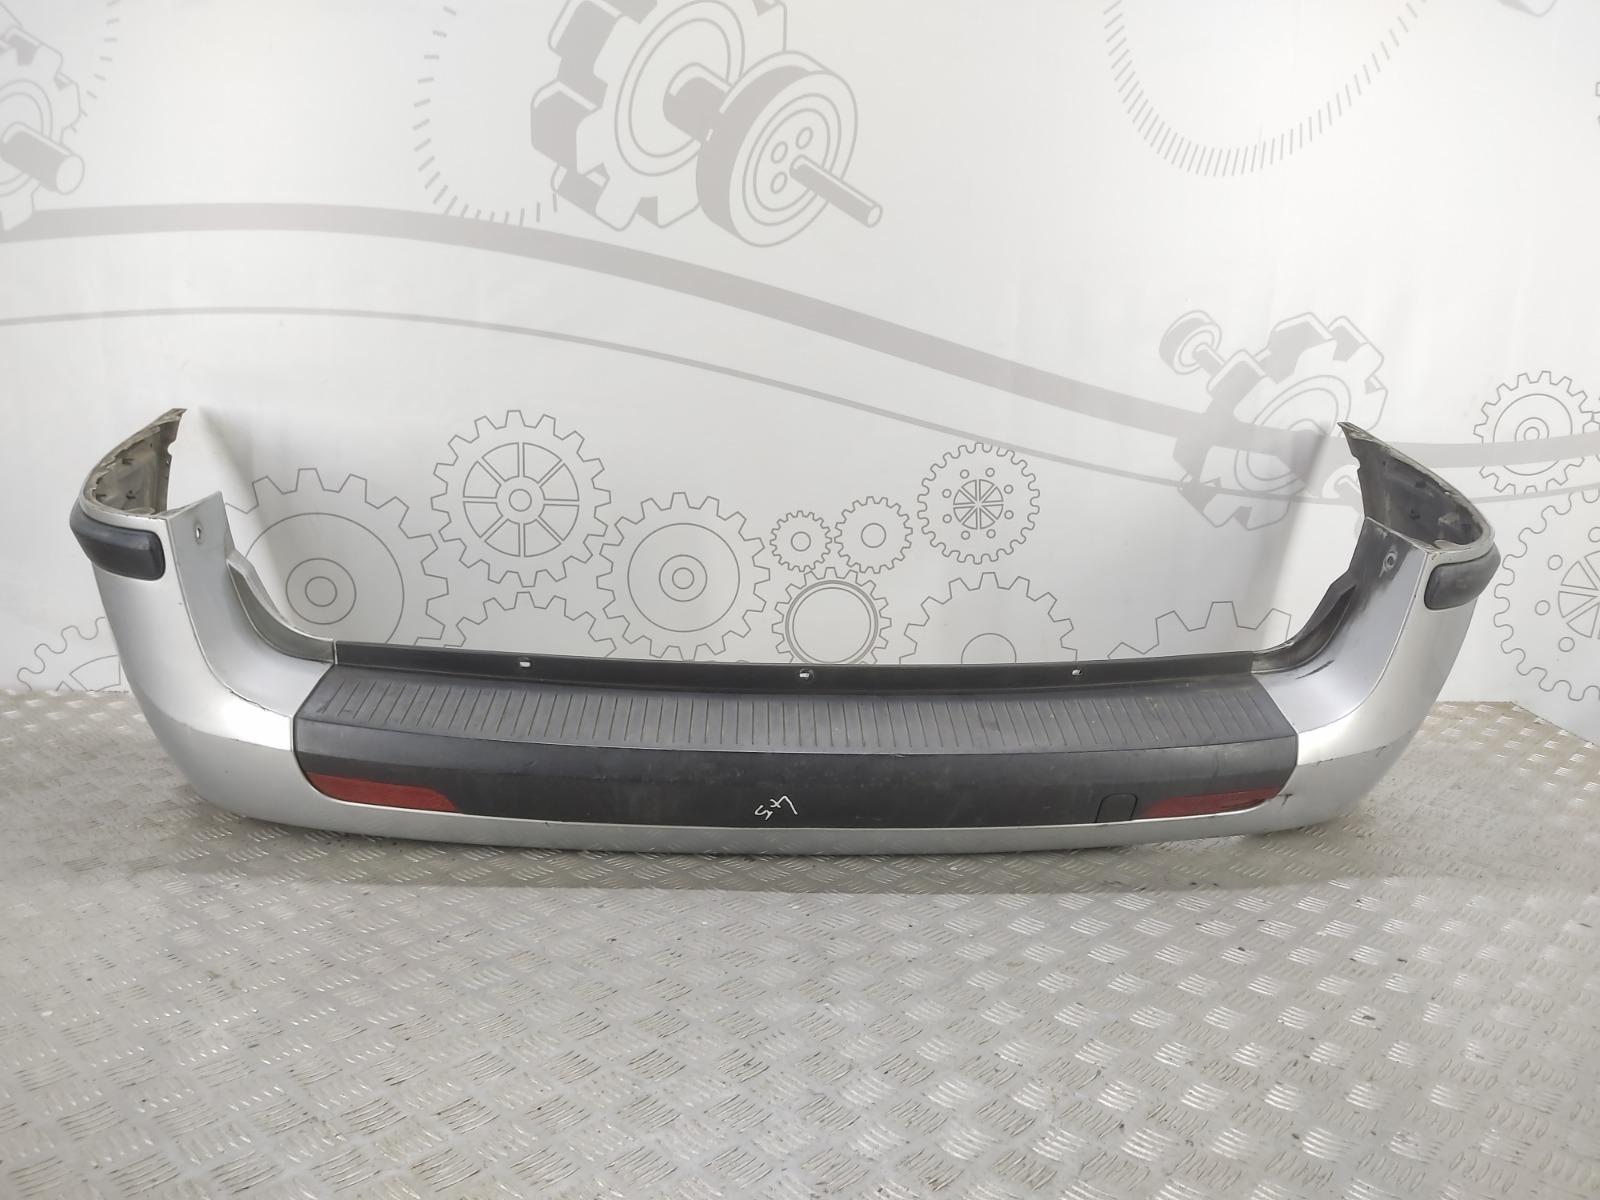 Бампер задний Fiat Ulysse 2.0 I 2005 (б/у)